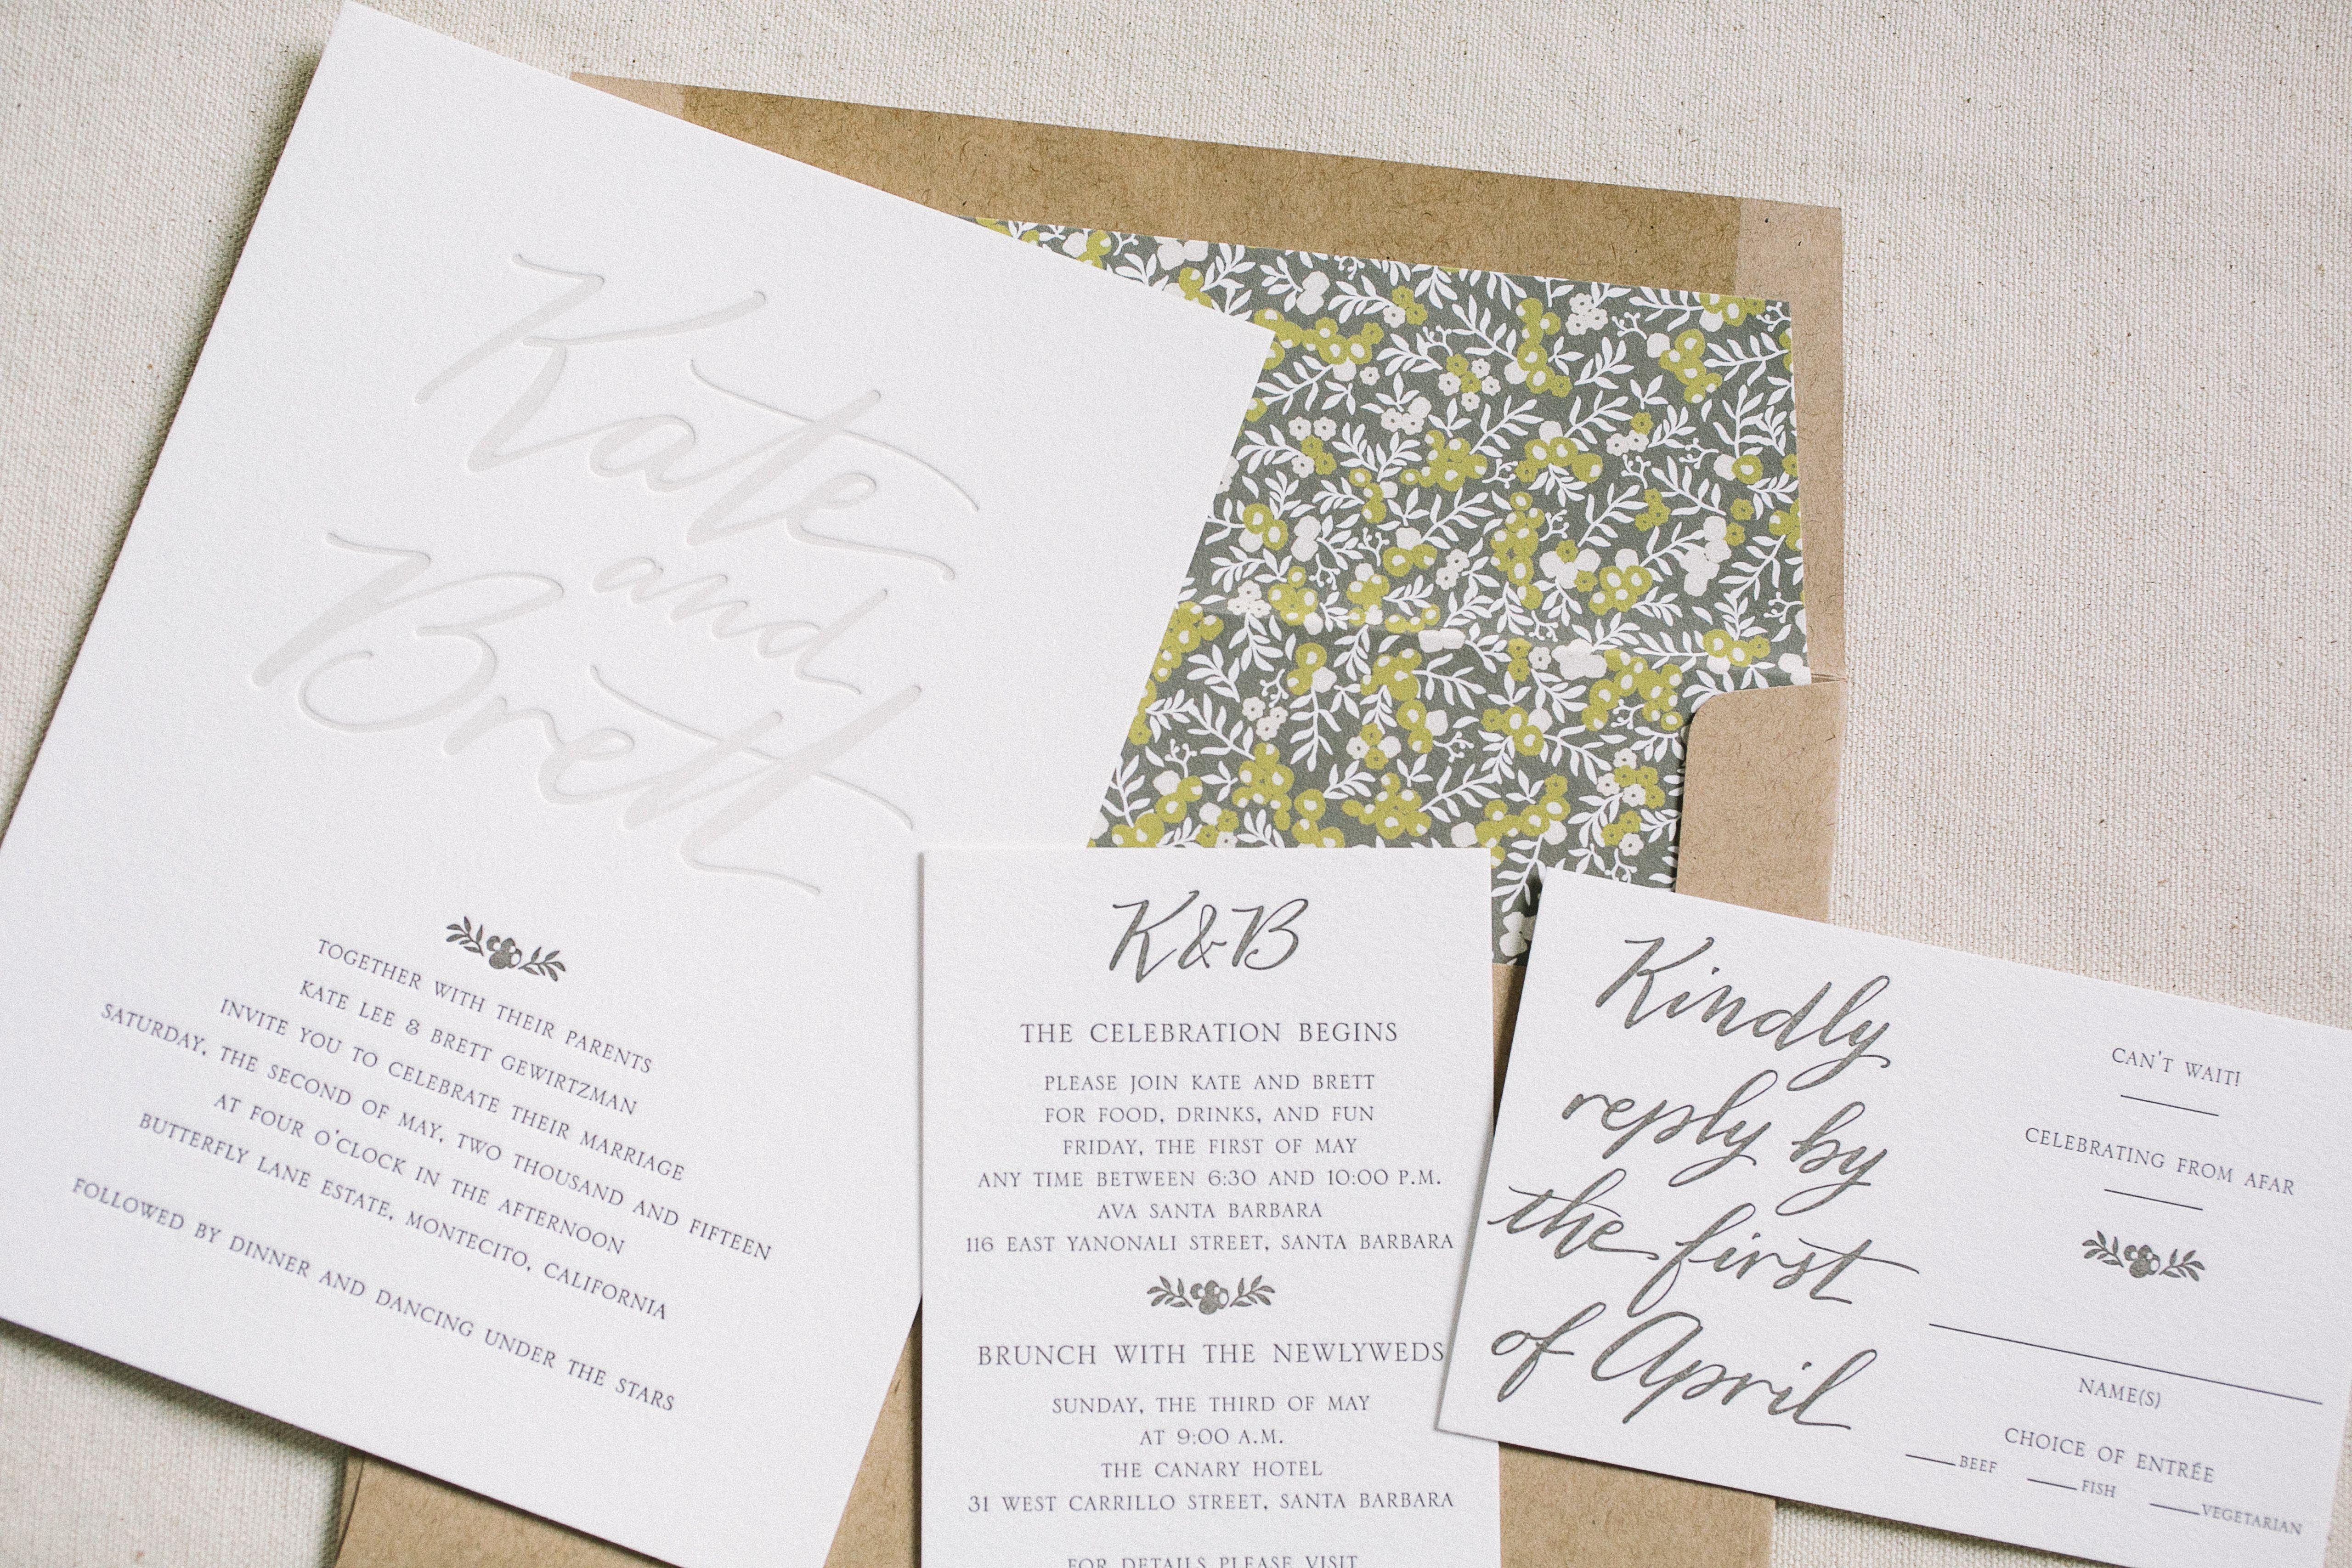 Custom calligraphy wedding bella figura wallpaper hd diy invitation ideas of best androids